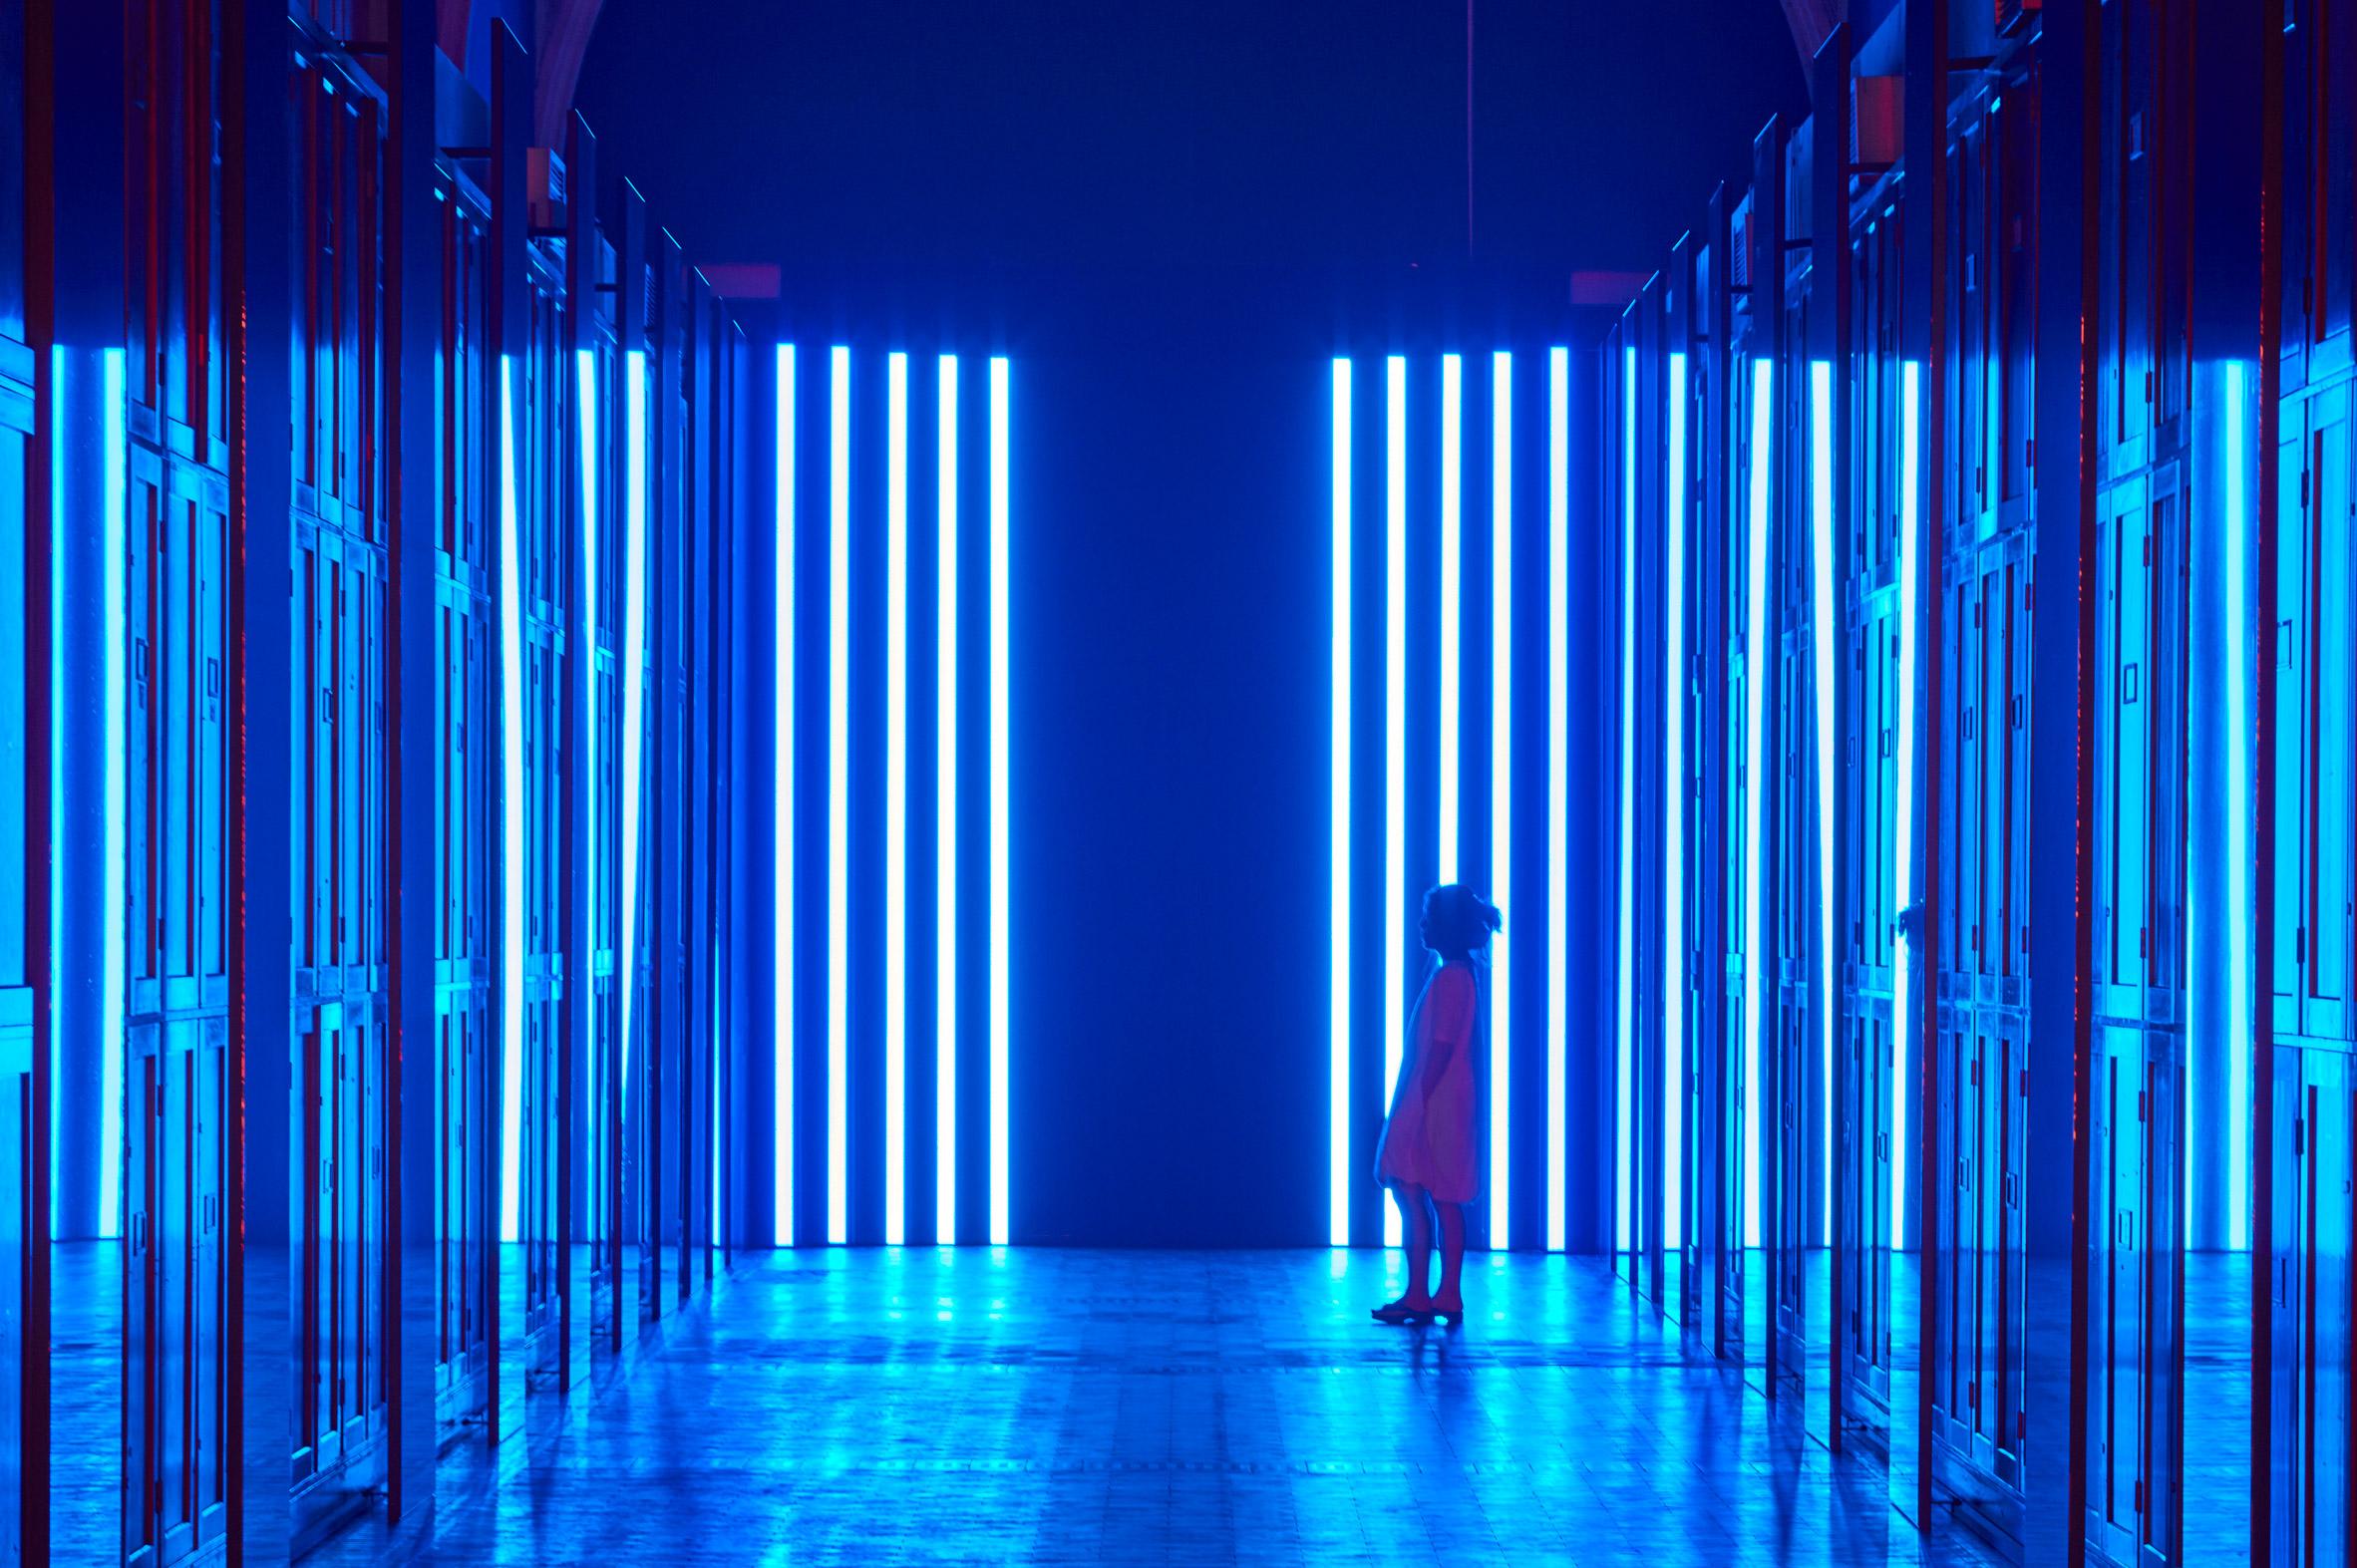 Reflection Room by Flynn Talbot at London Design Festival 2017